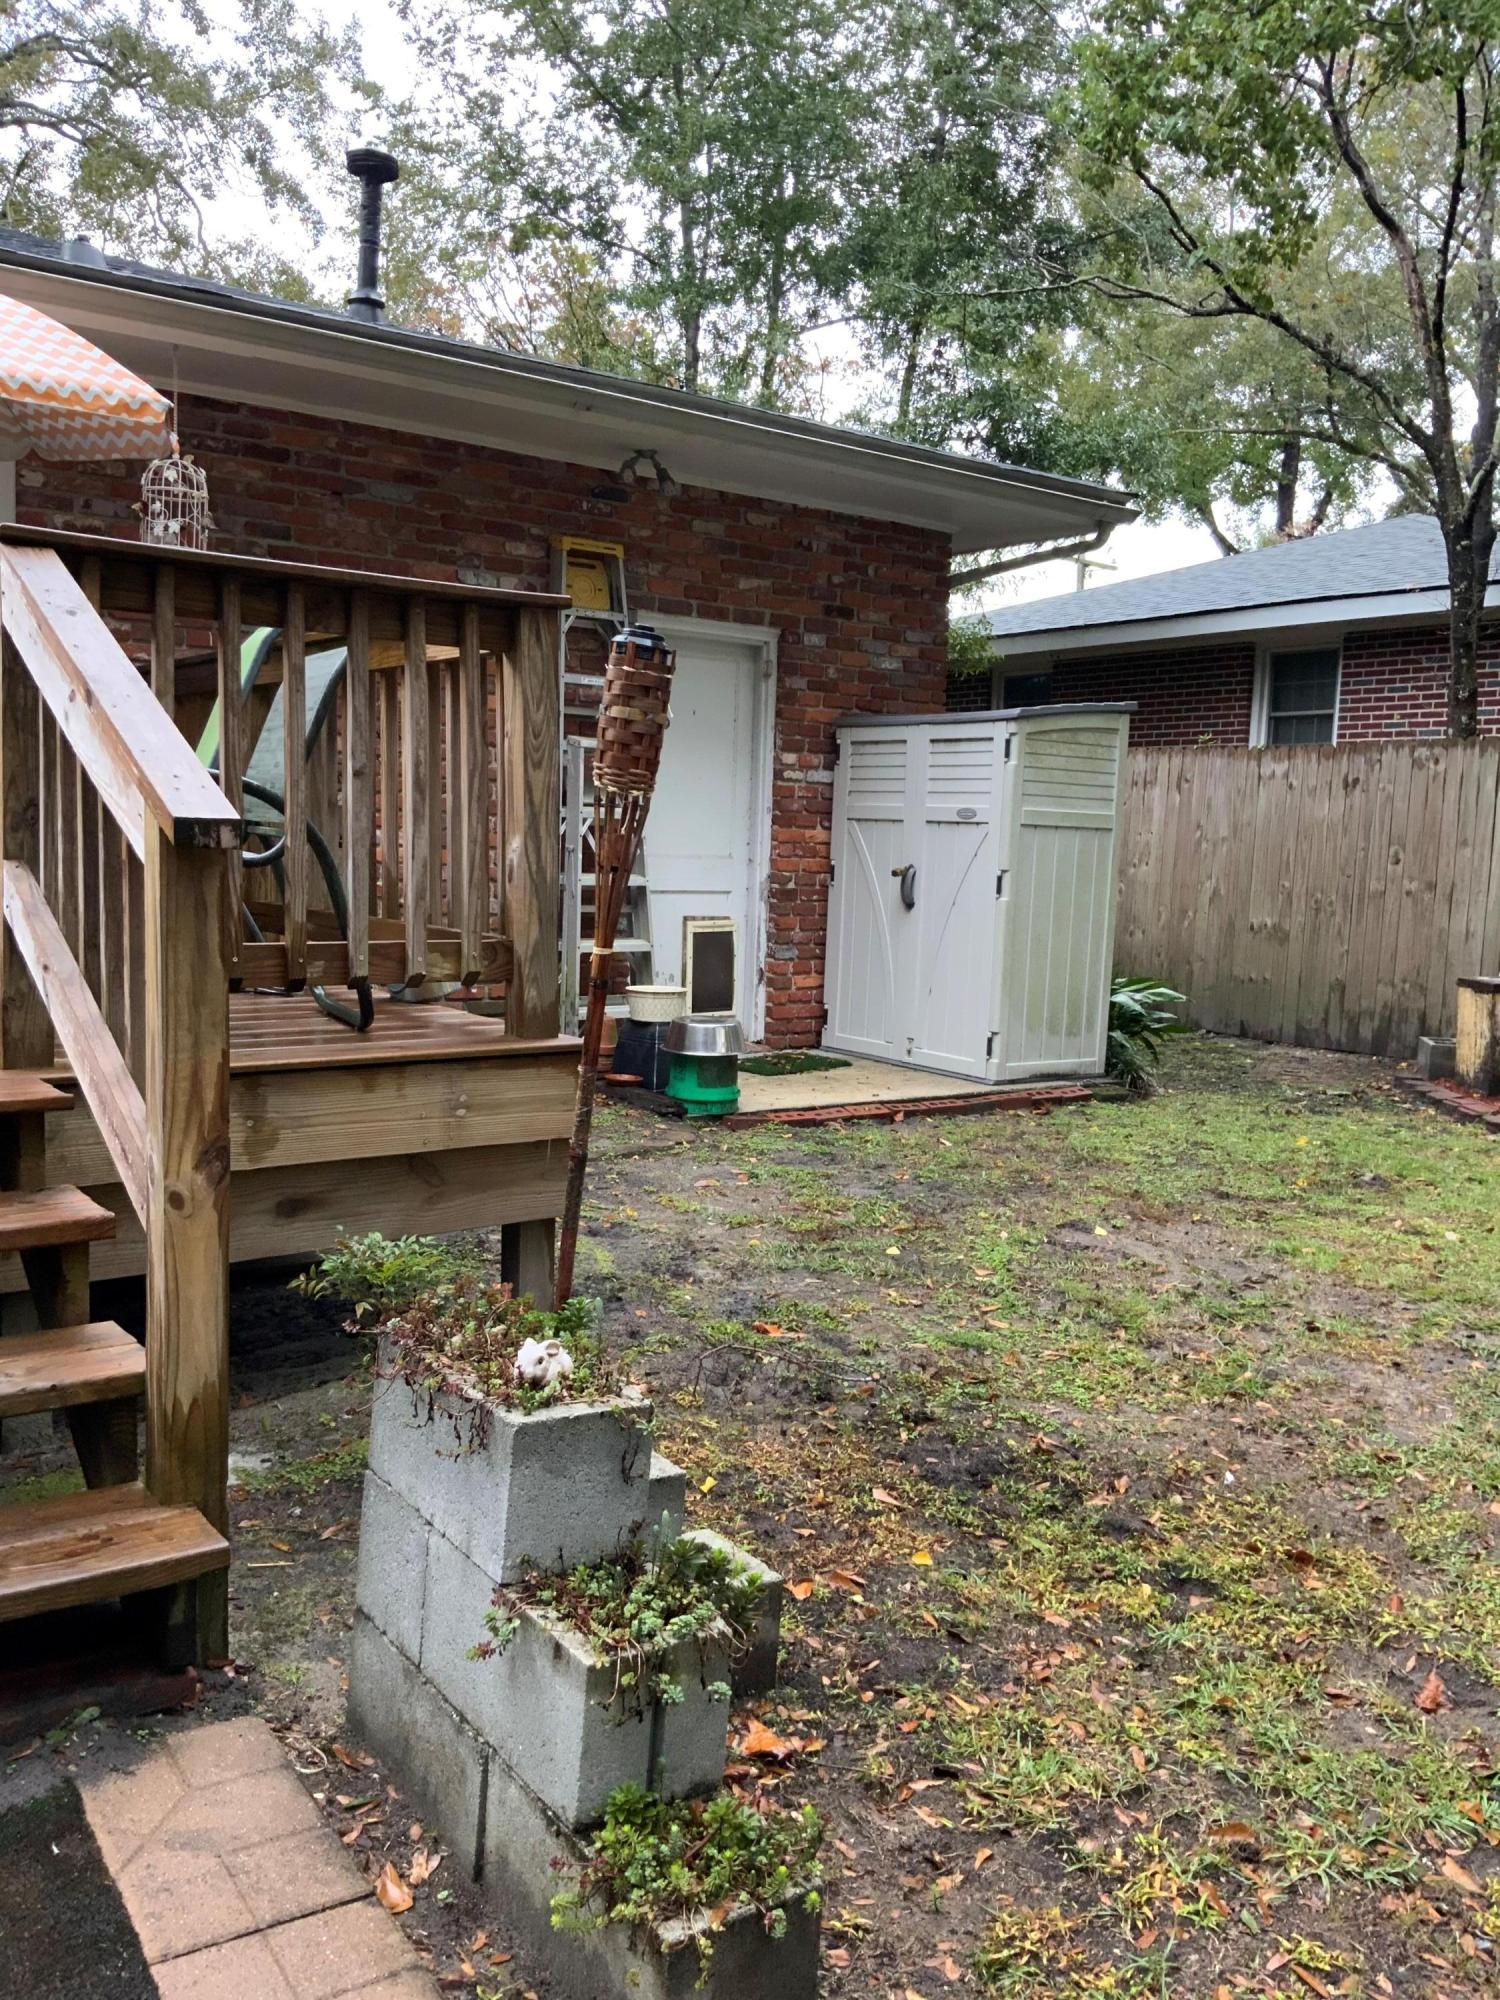 Northbridge Terrace Homes For Sale - 1156 Northbridge, Charleston, SC - 4